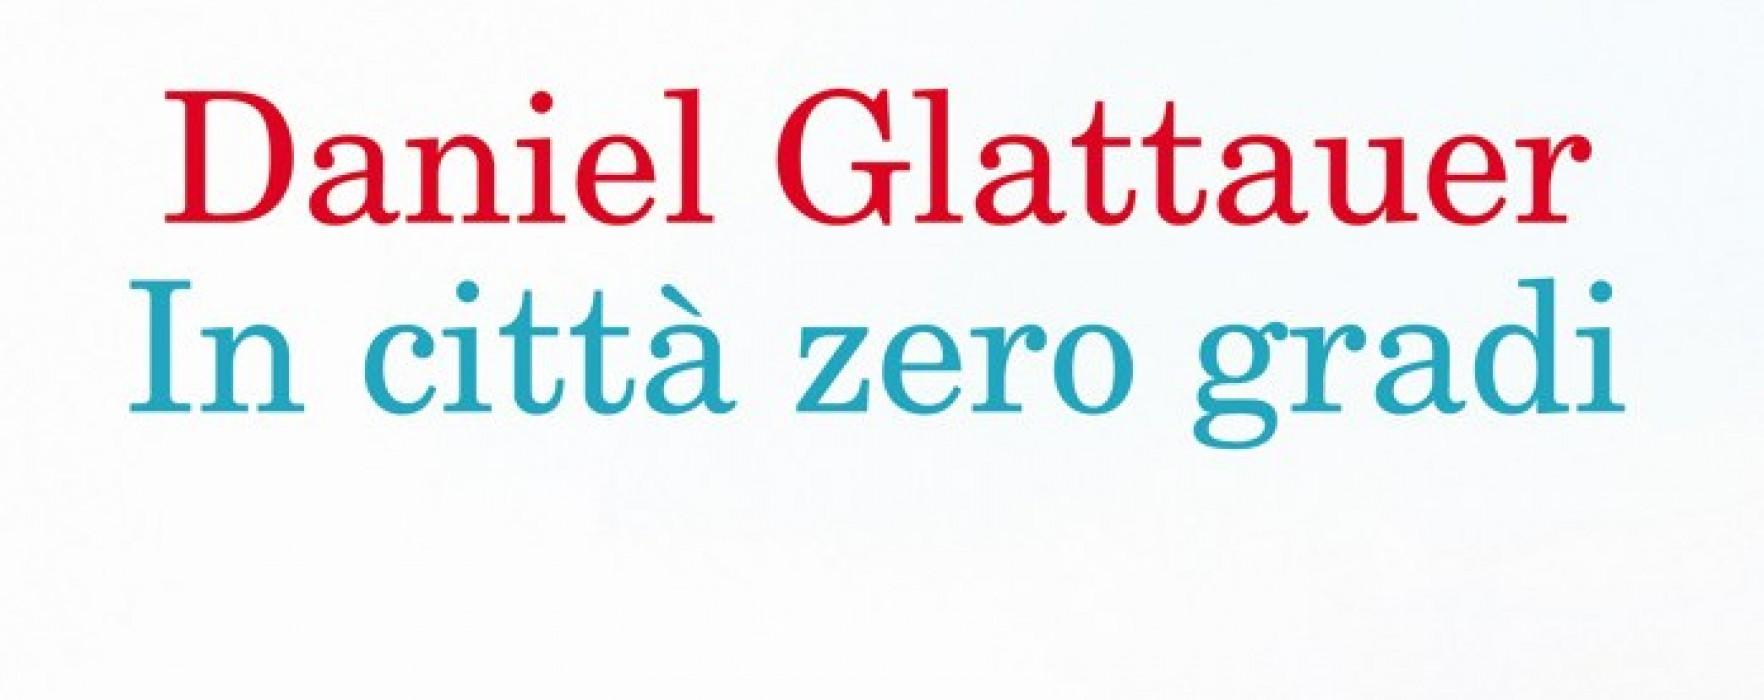 Daniel Glattauer: Freddo glaciale senza risate